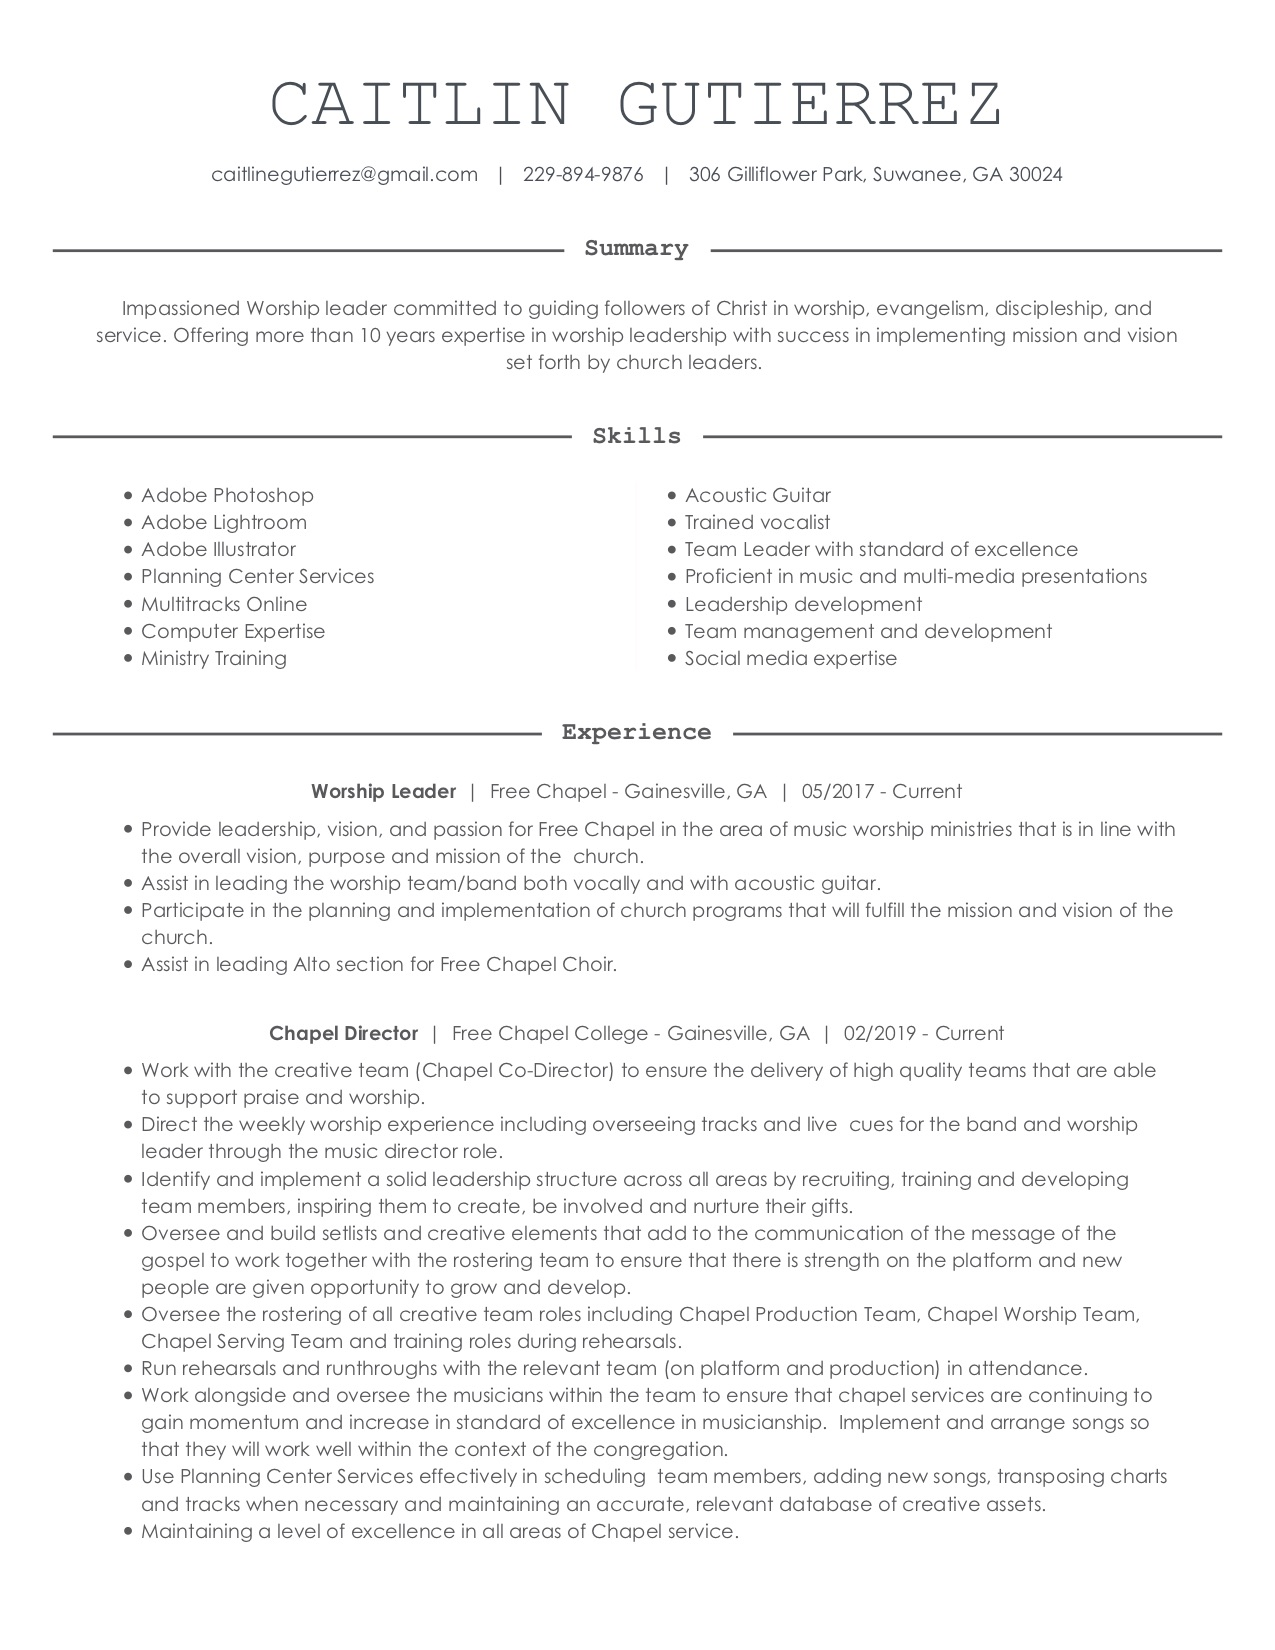 FINAL COPY CEG RESUME PAGE 1.jpg